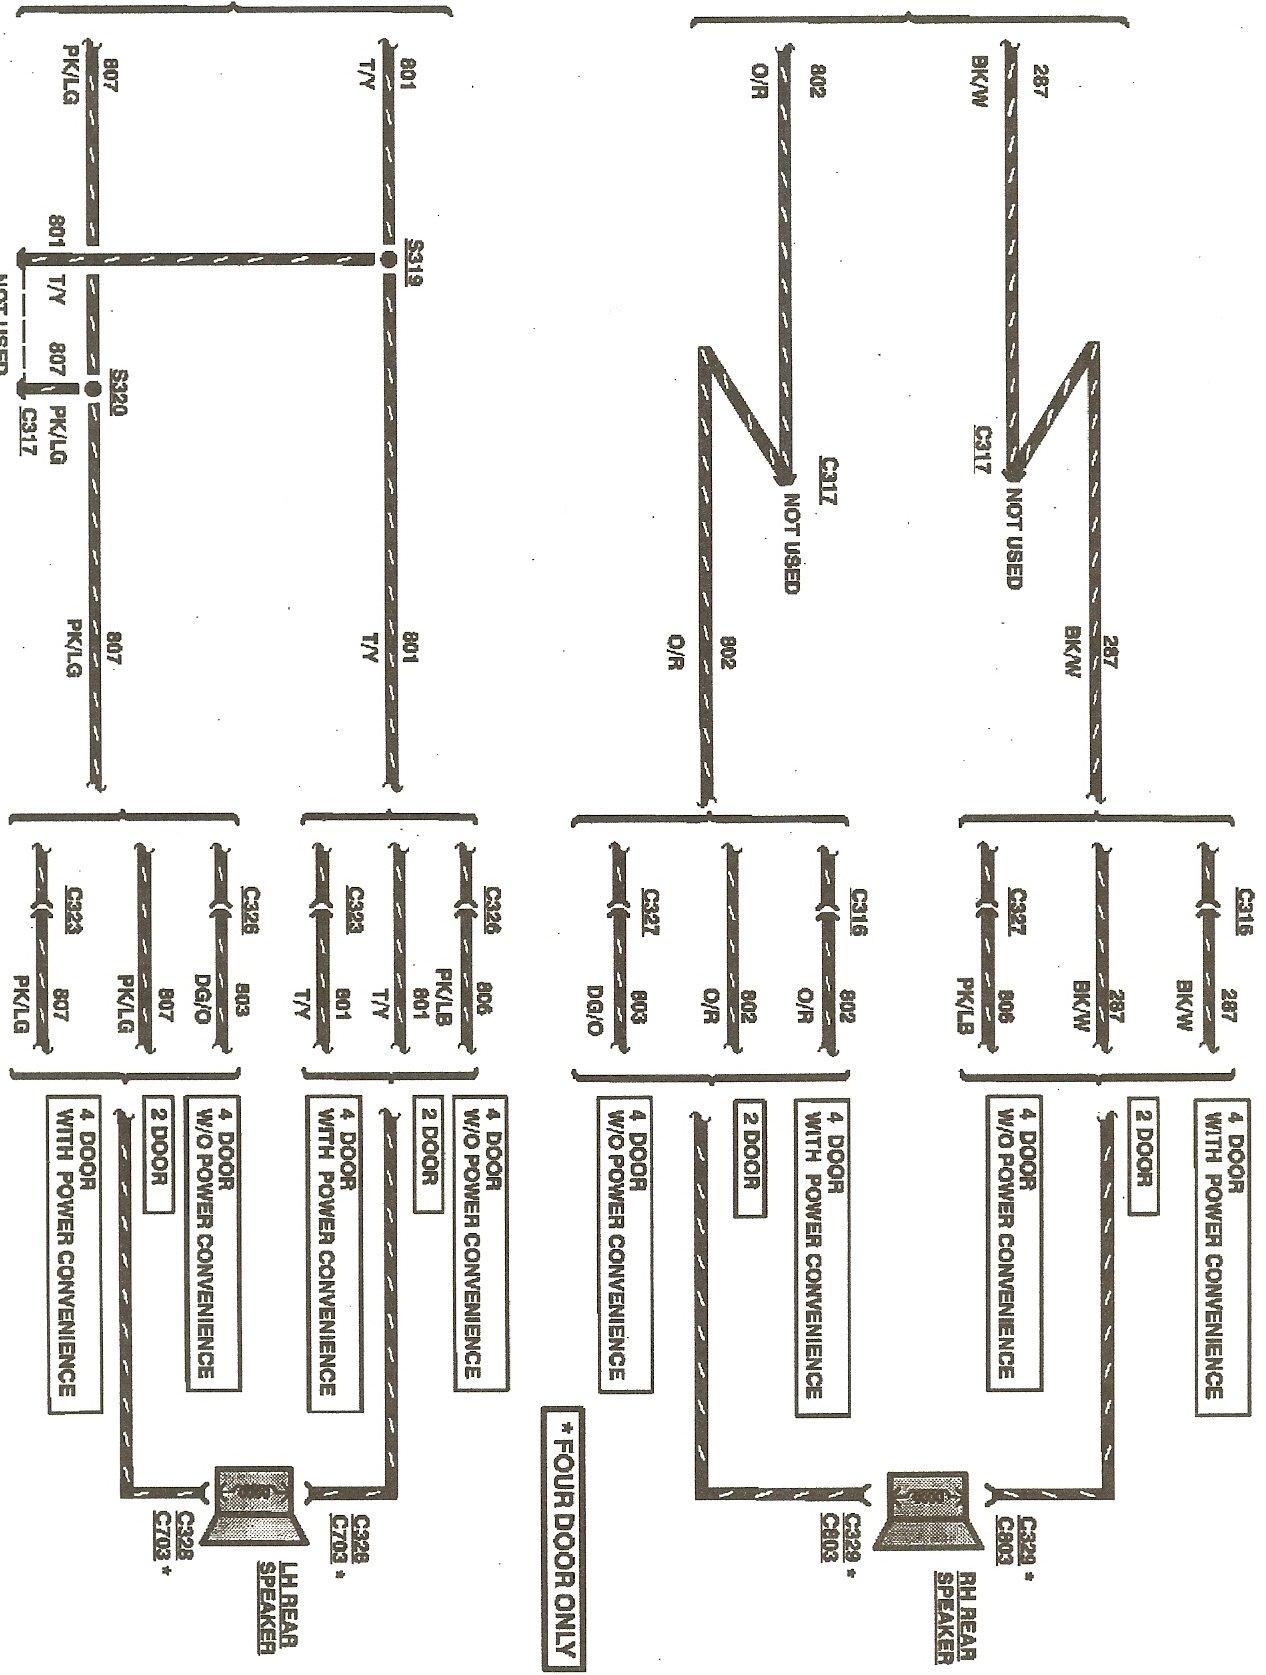 Fh Ddx 616 Kenwood Stereo Wiring Diagram Free Diagram